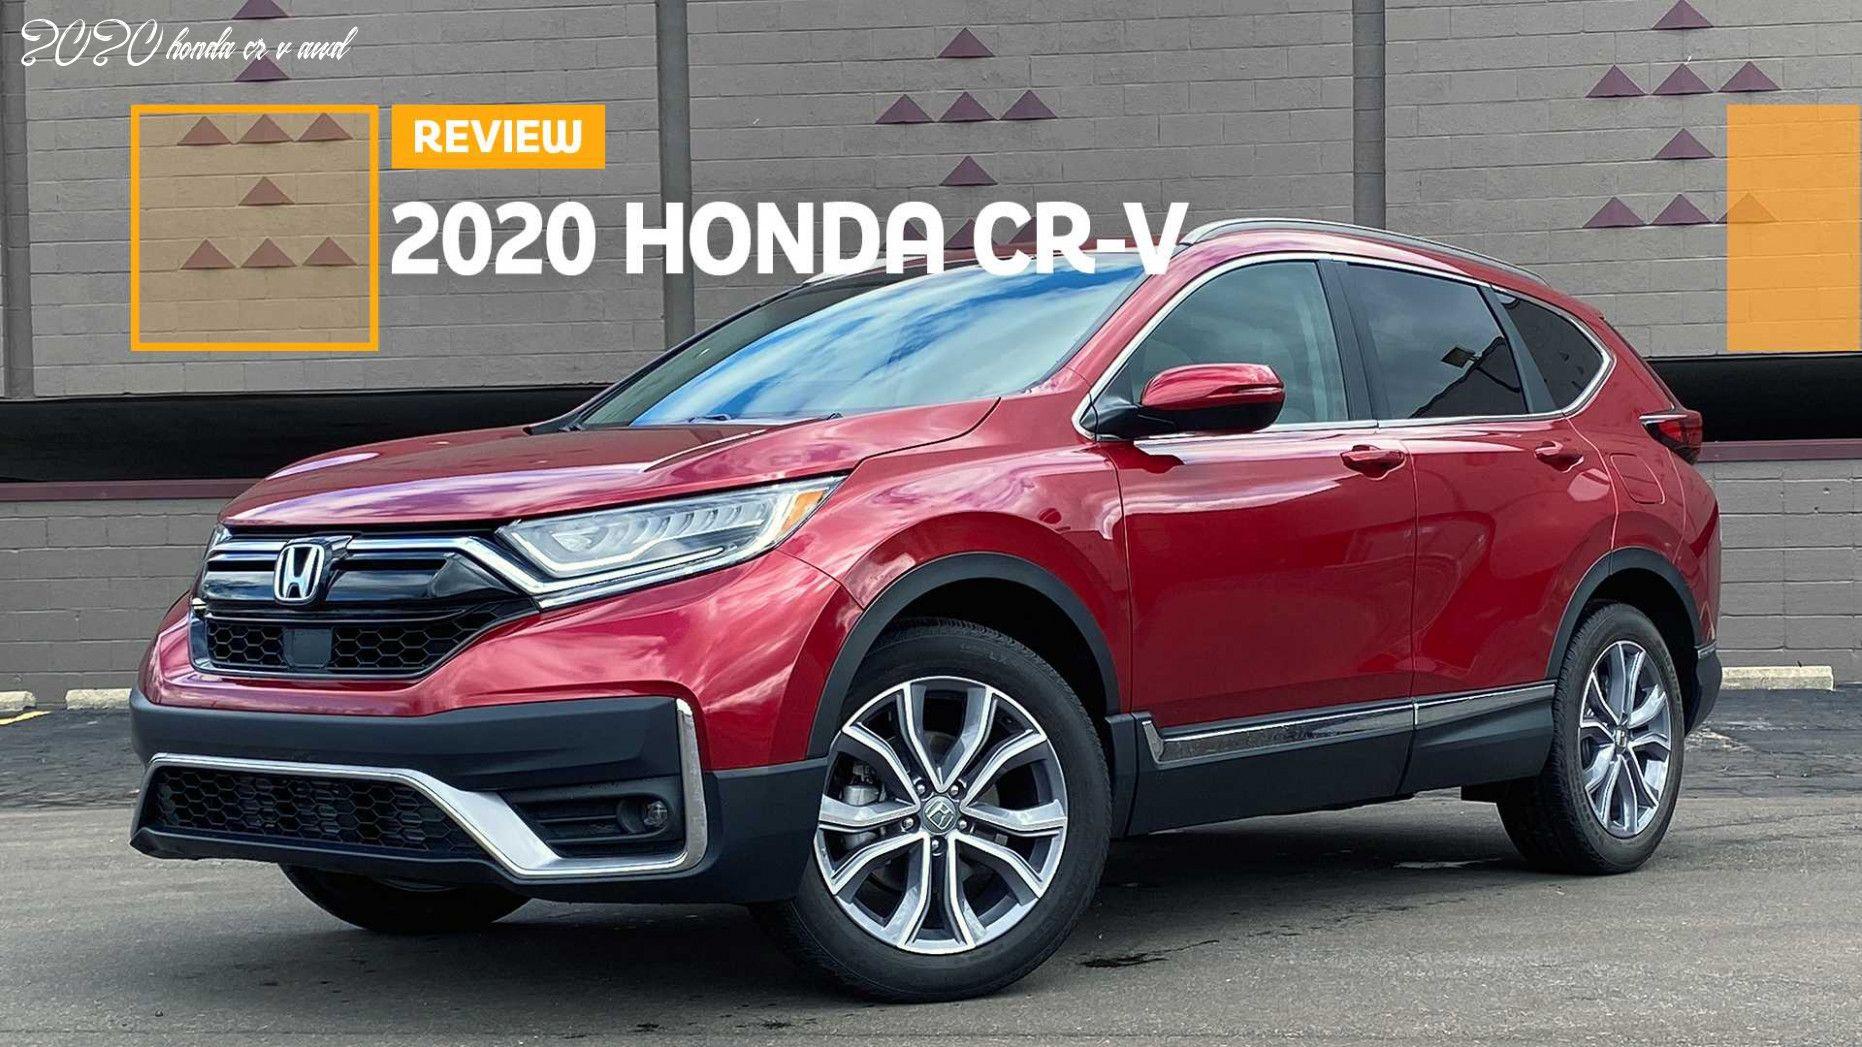 2020 Honda Cr V Awd In 2020 Honda Crv Touring Honda Cr Honda Accord Touring